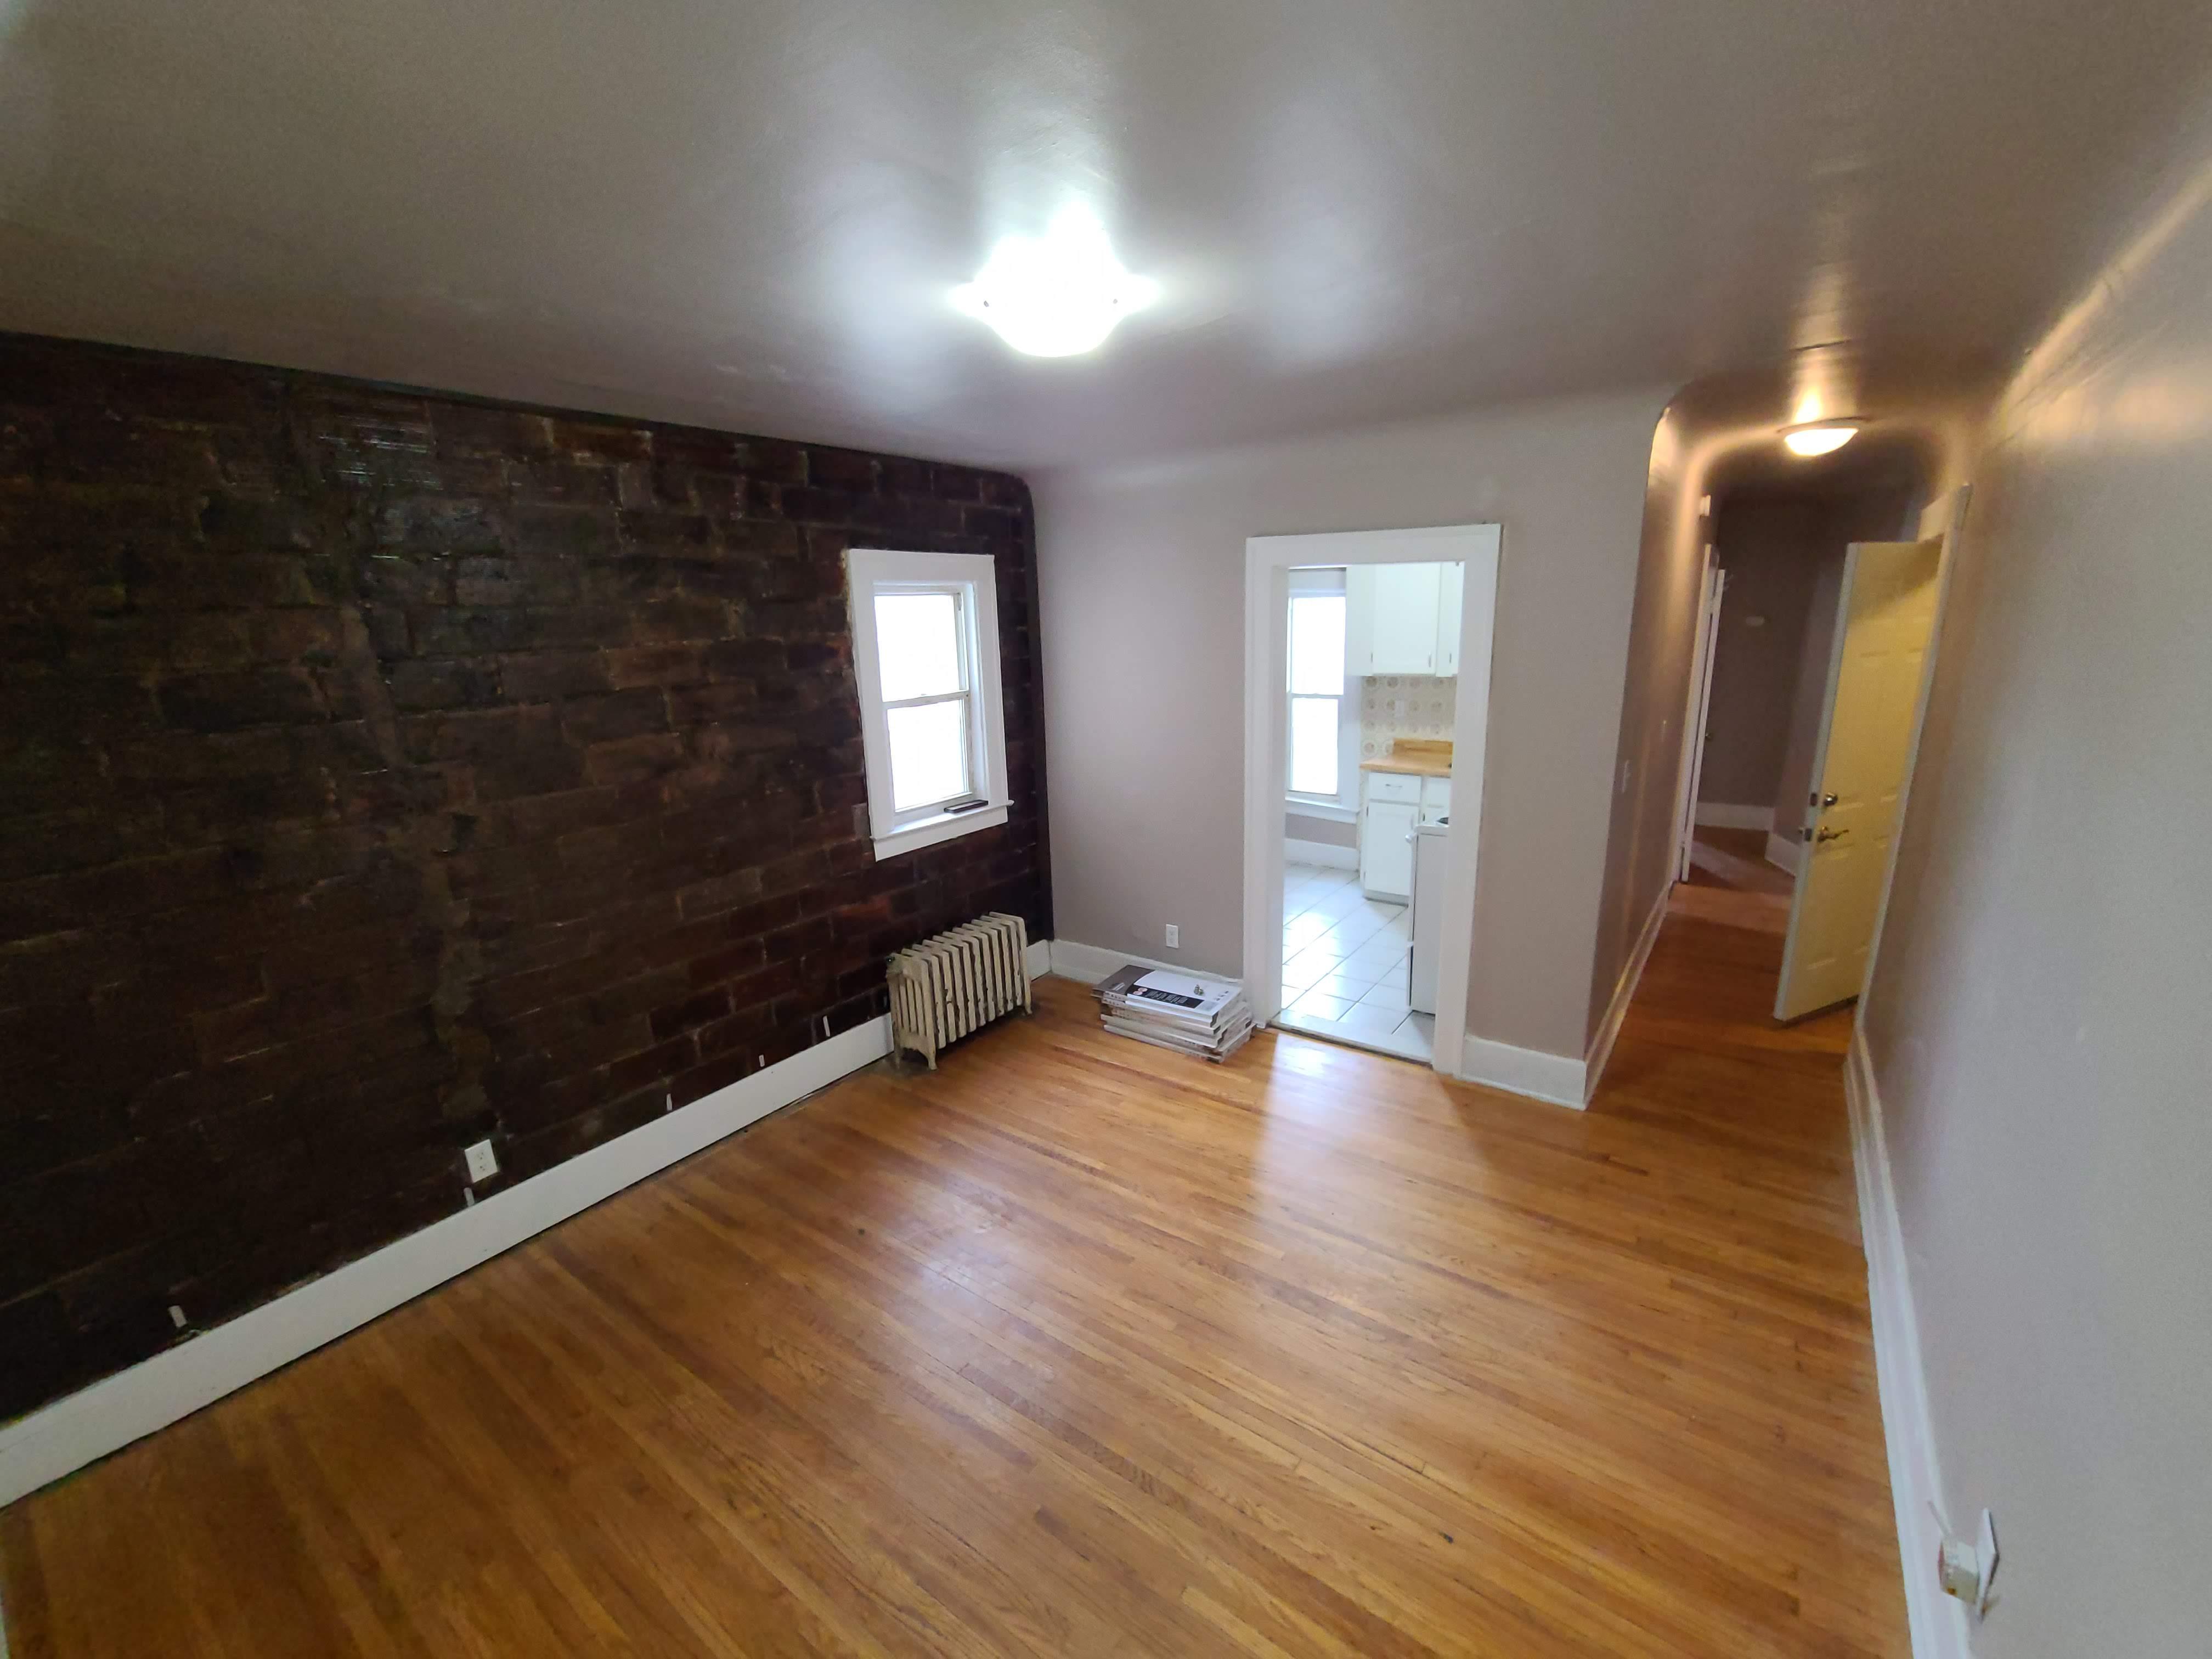 881-883-885 Erie Street E, Windsor, Ontario  N9A 3Y7 - Photo 18 - RP1188742101